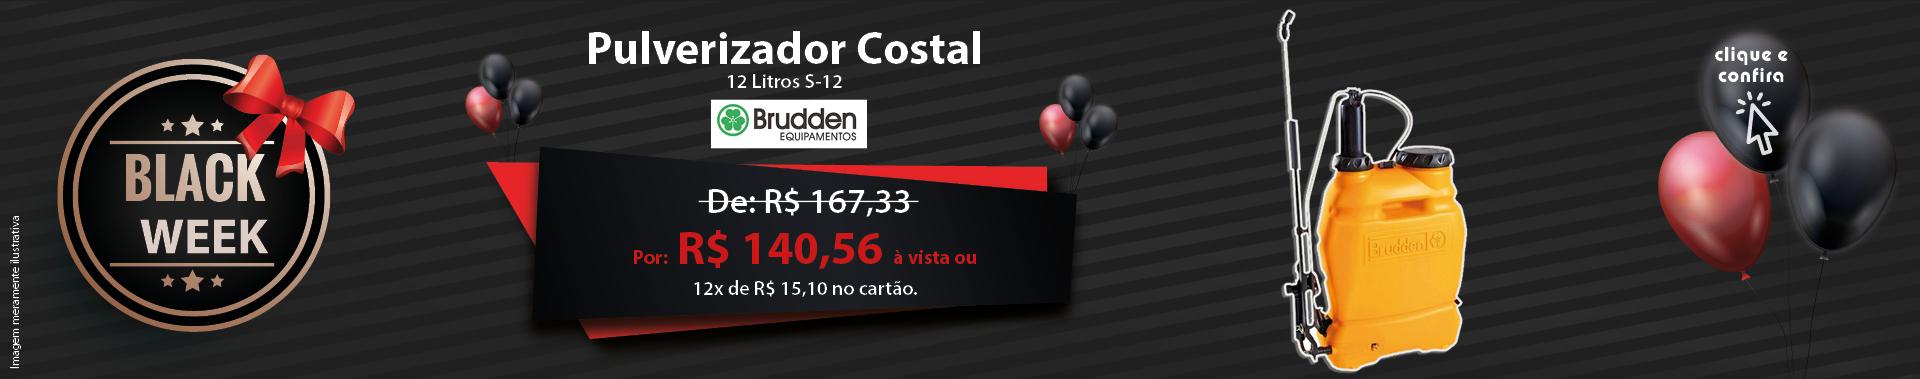 Pulverizador Costal com Capacidade de 12 Litros S-12 BRUDDEN-804